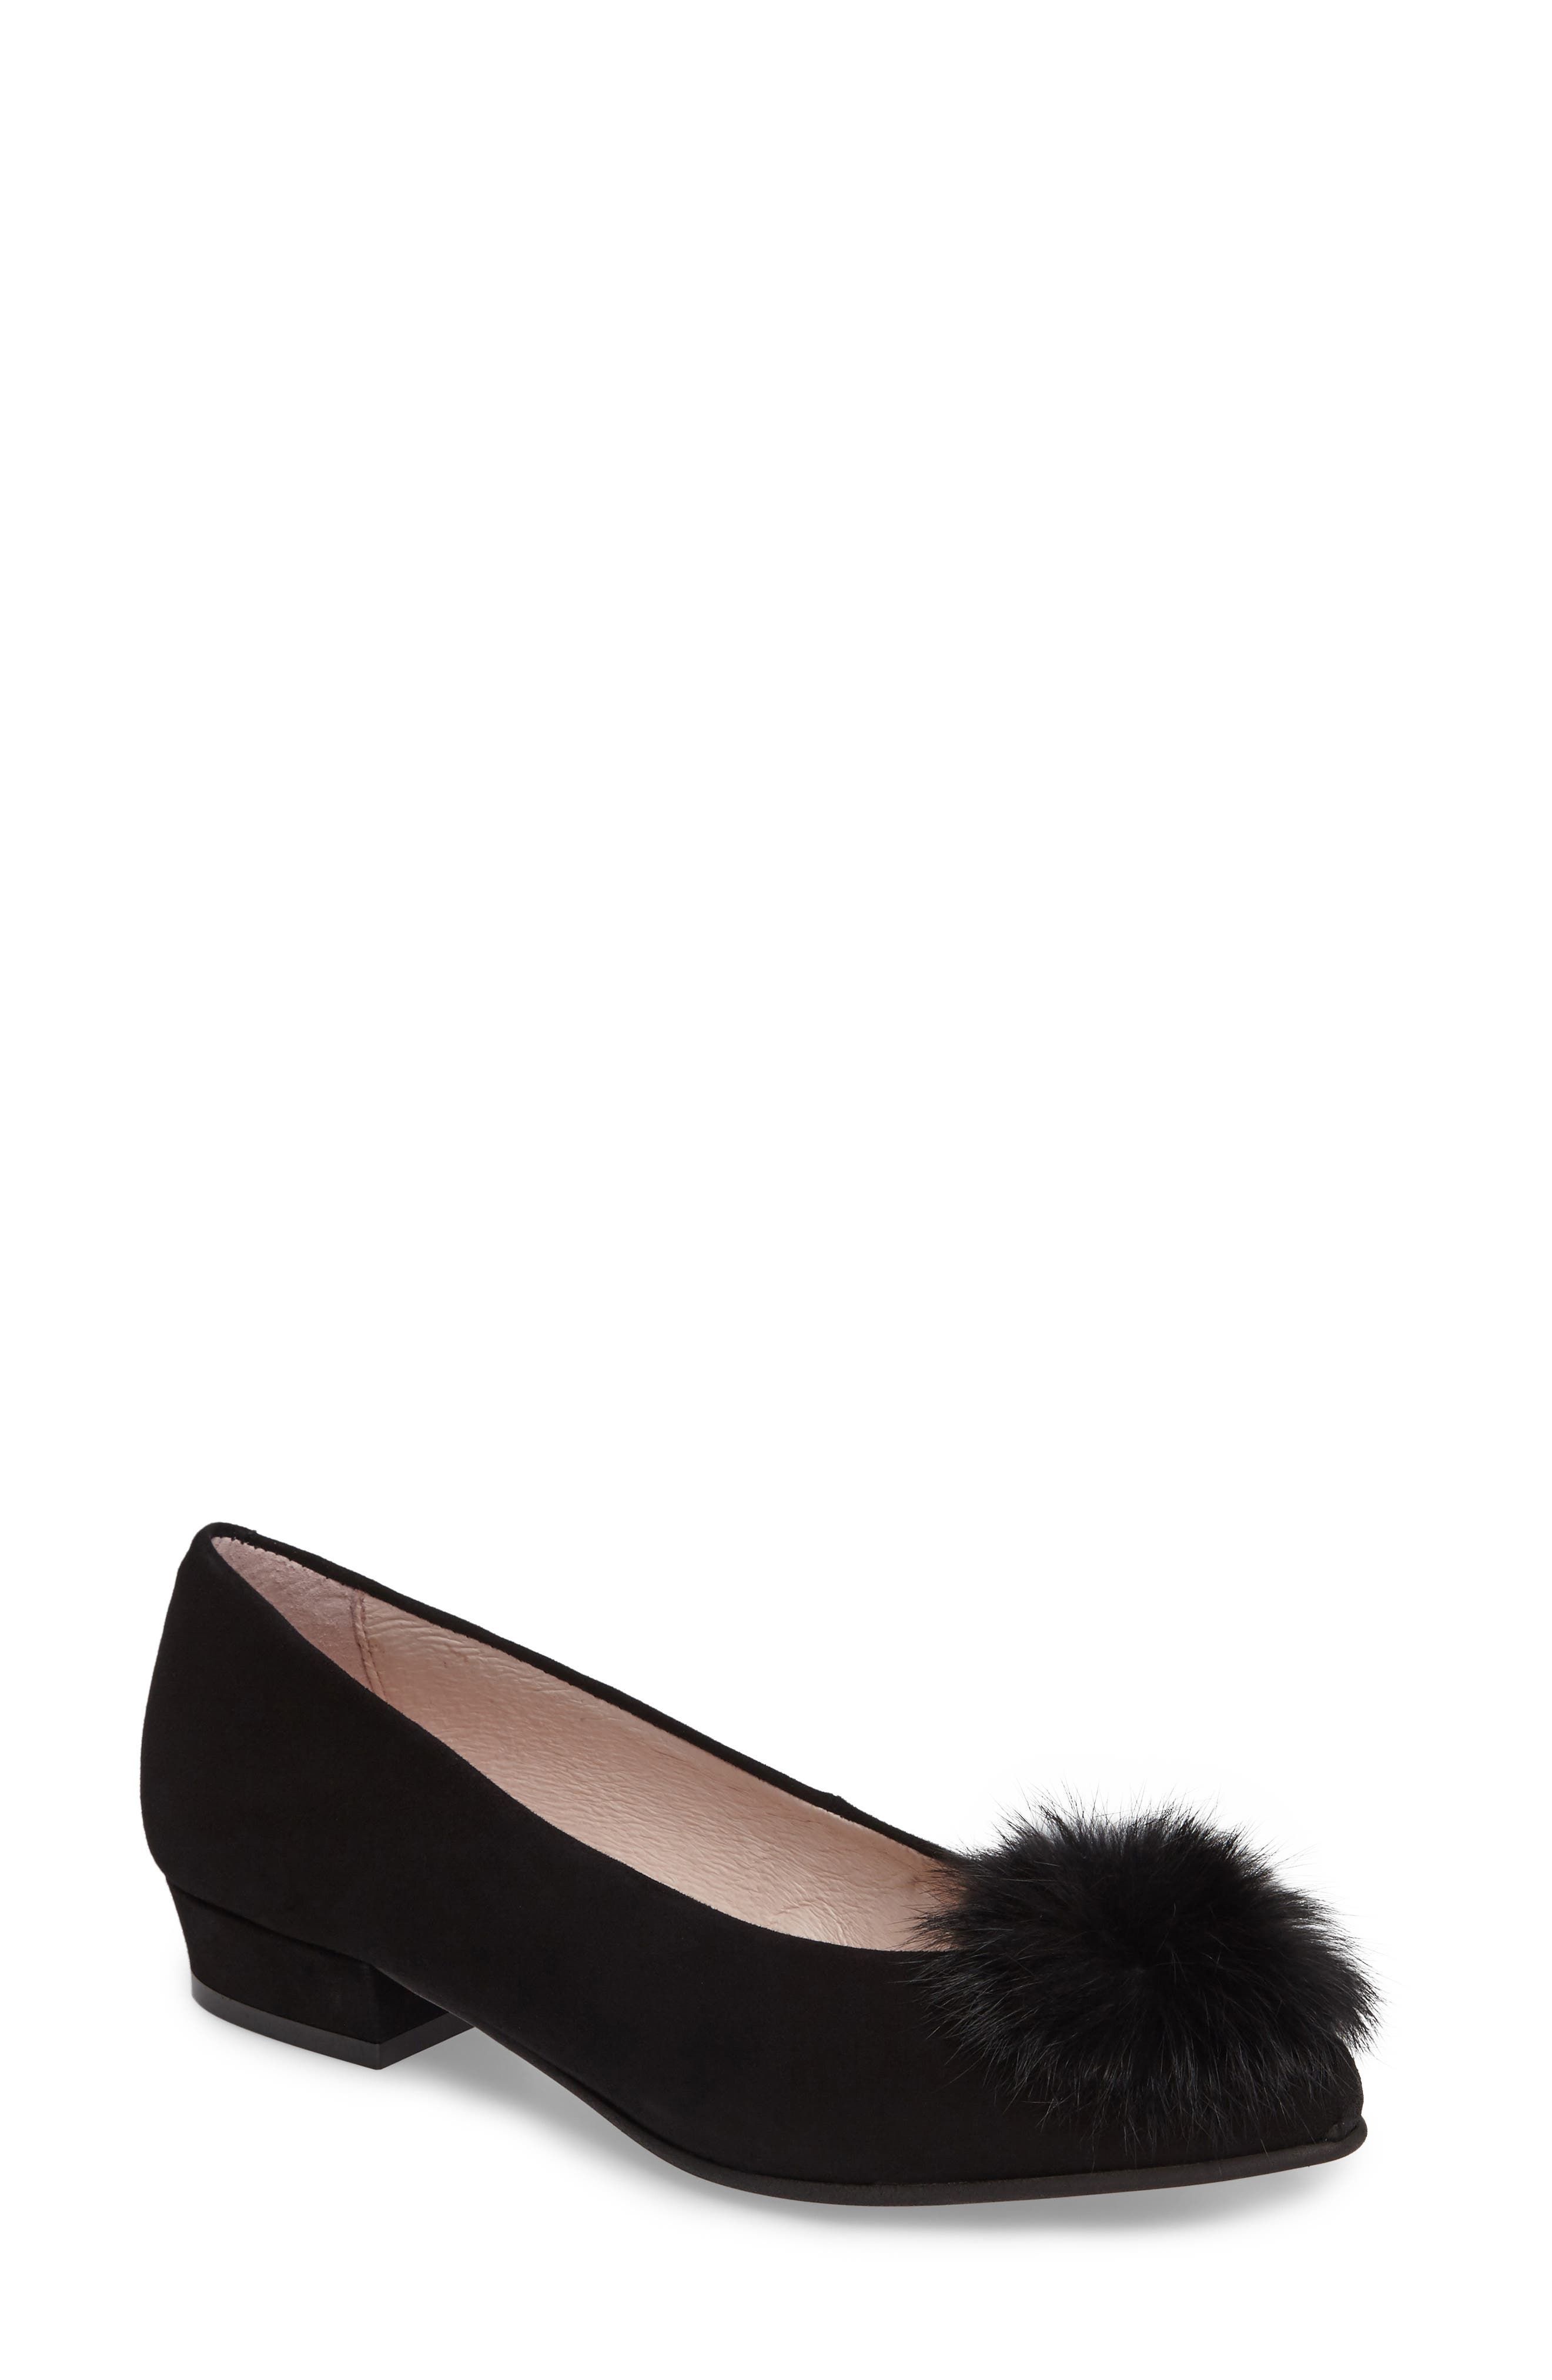 Sandy Flat with Genuine Rabbit Fur Pom,                         Main,                         color, 001